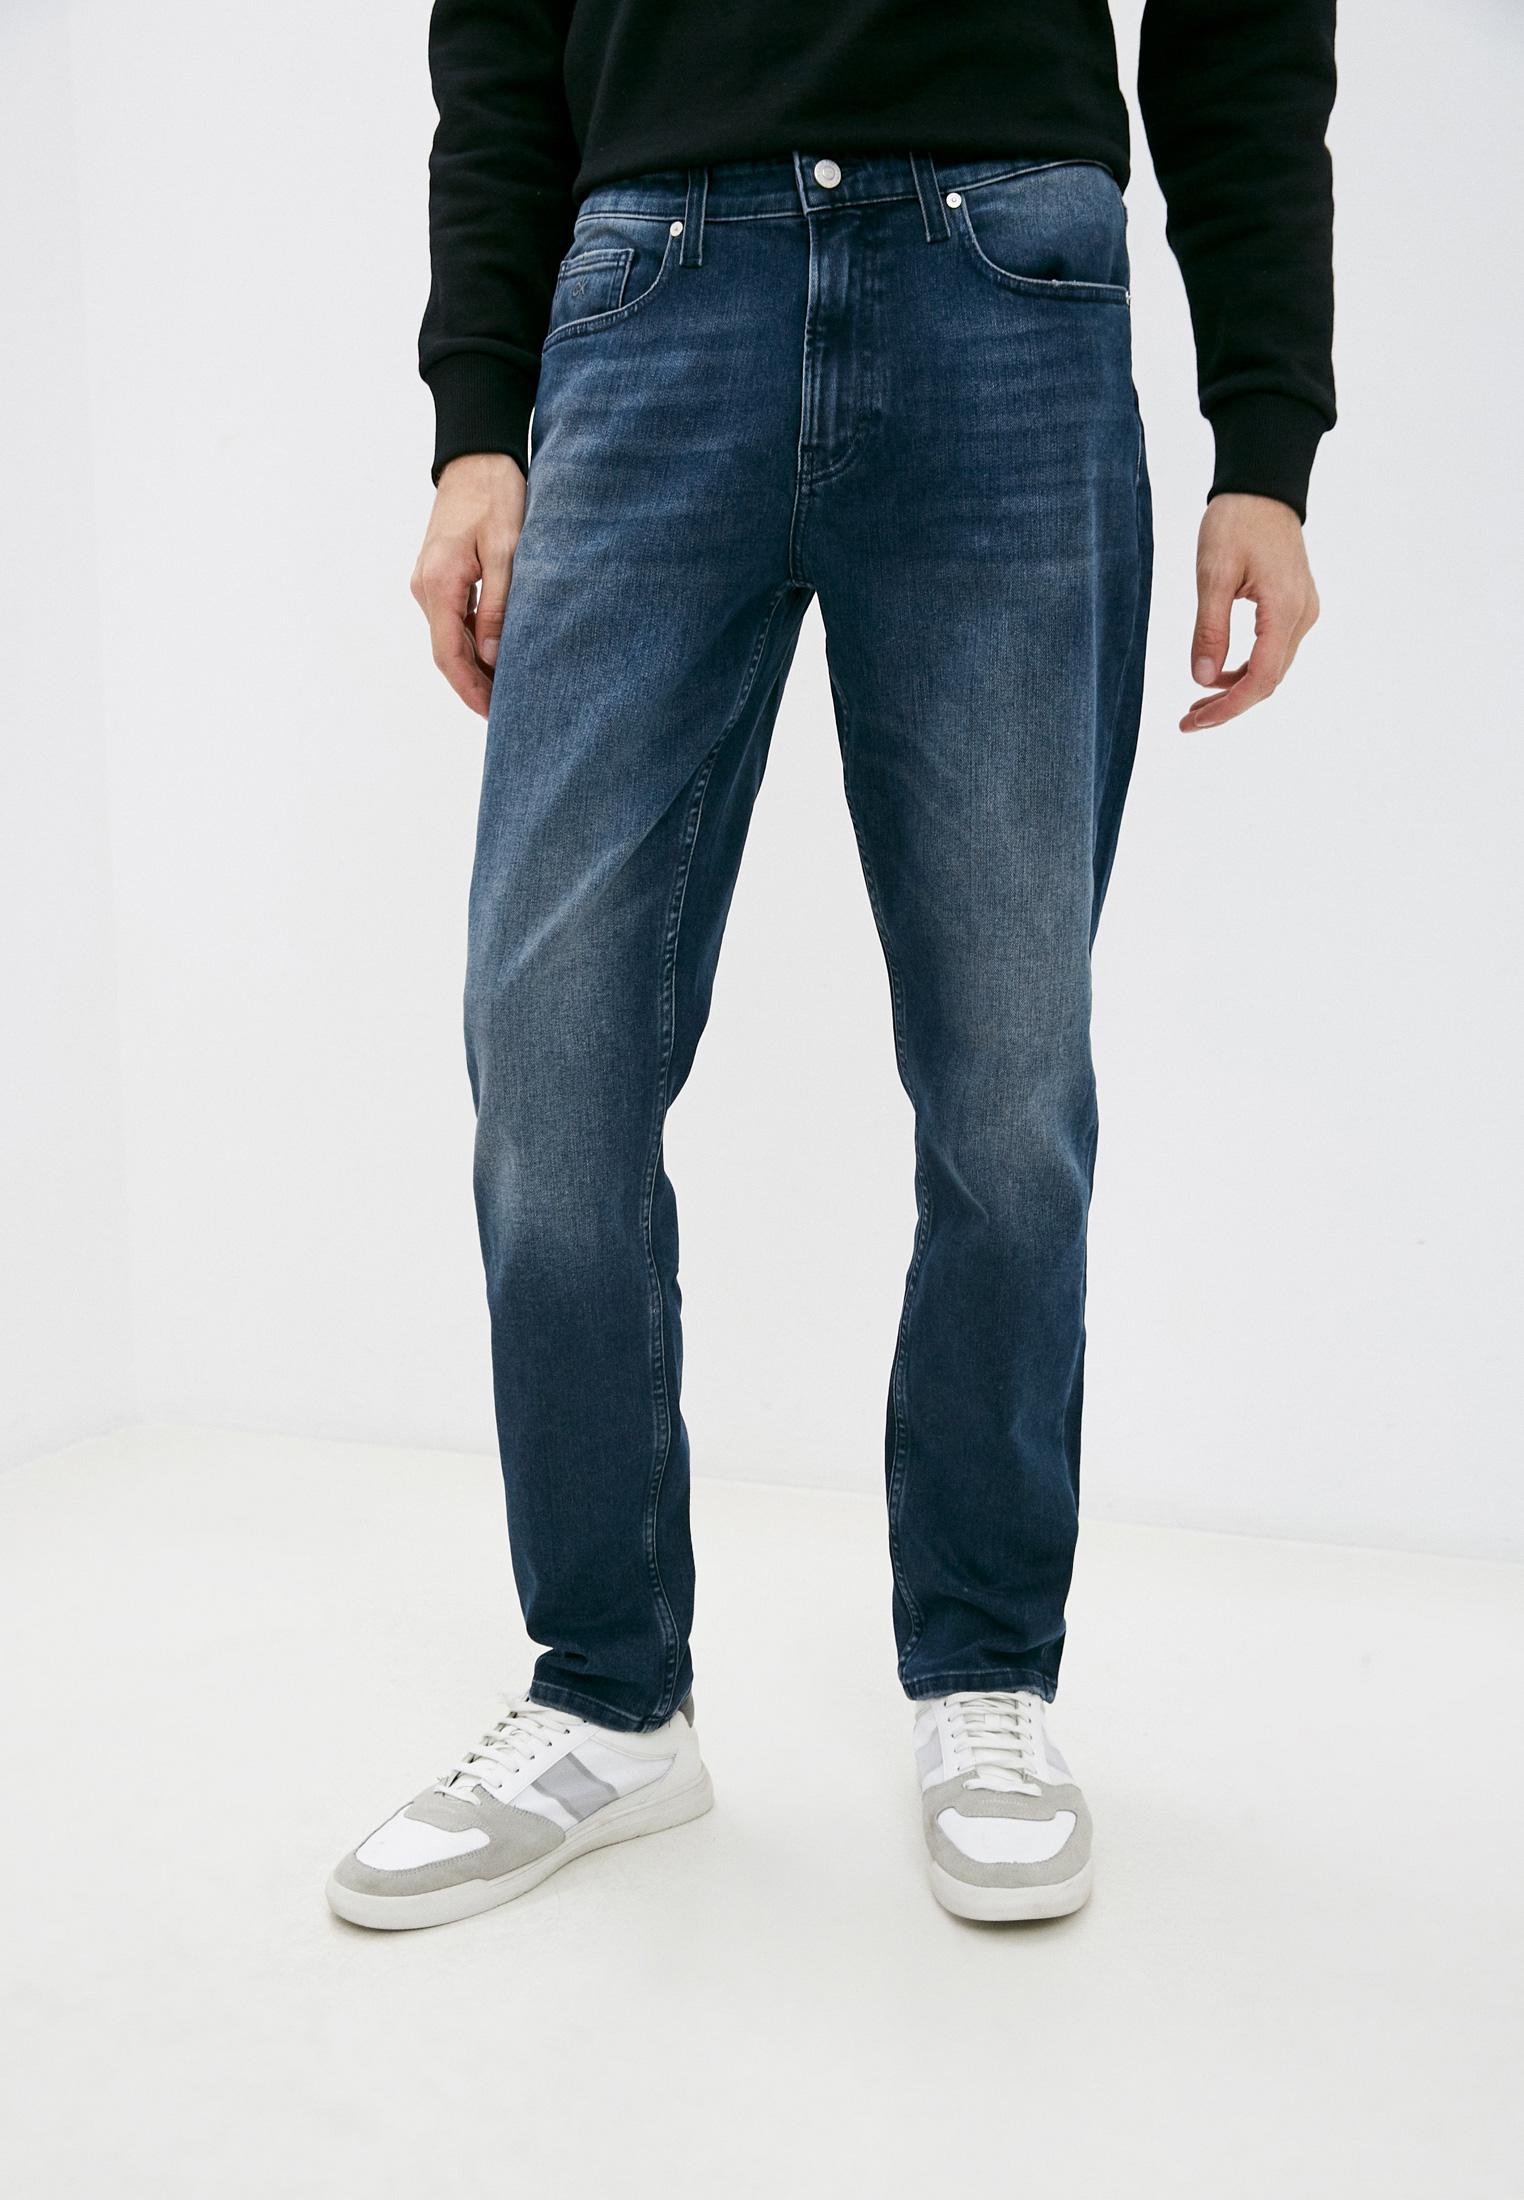 Мужские зауженные джинсы Calvin Klein (Кельвин Кляйн) k10k106191